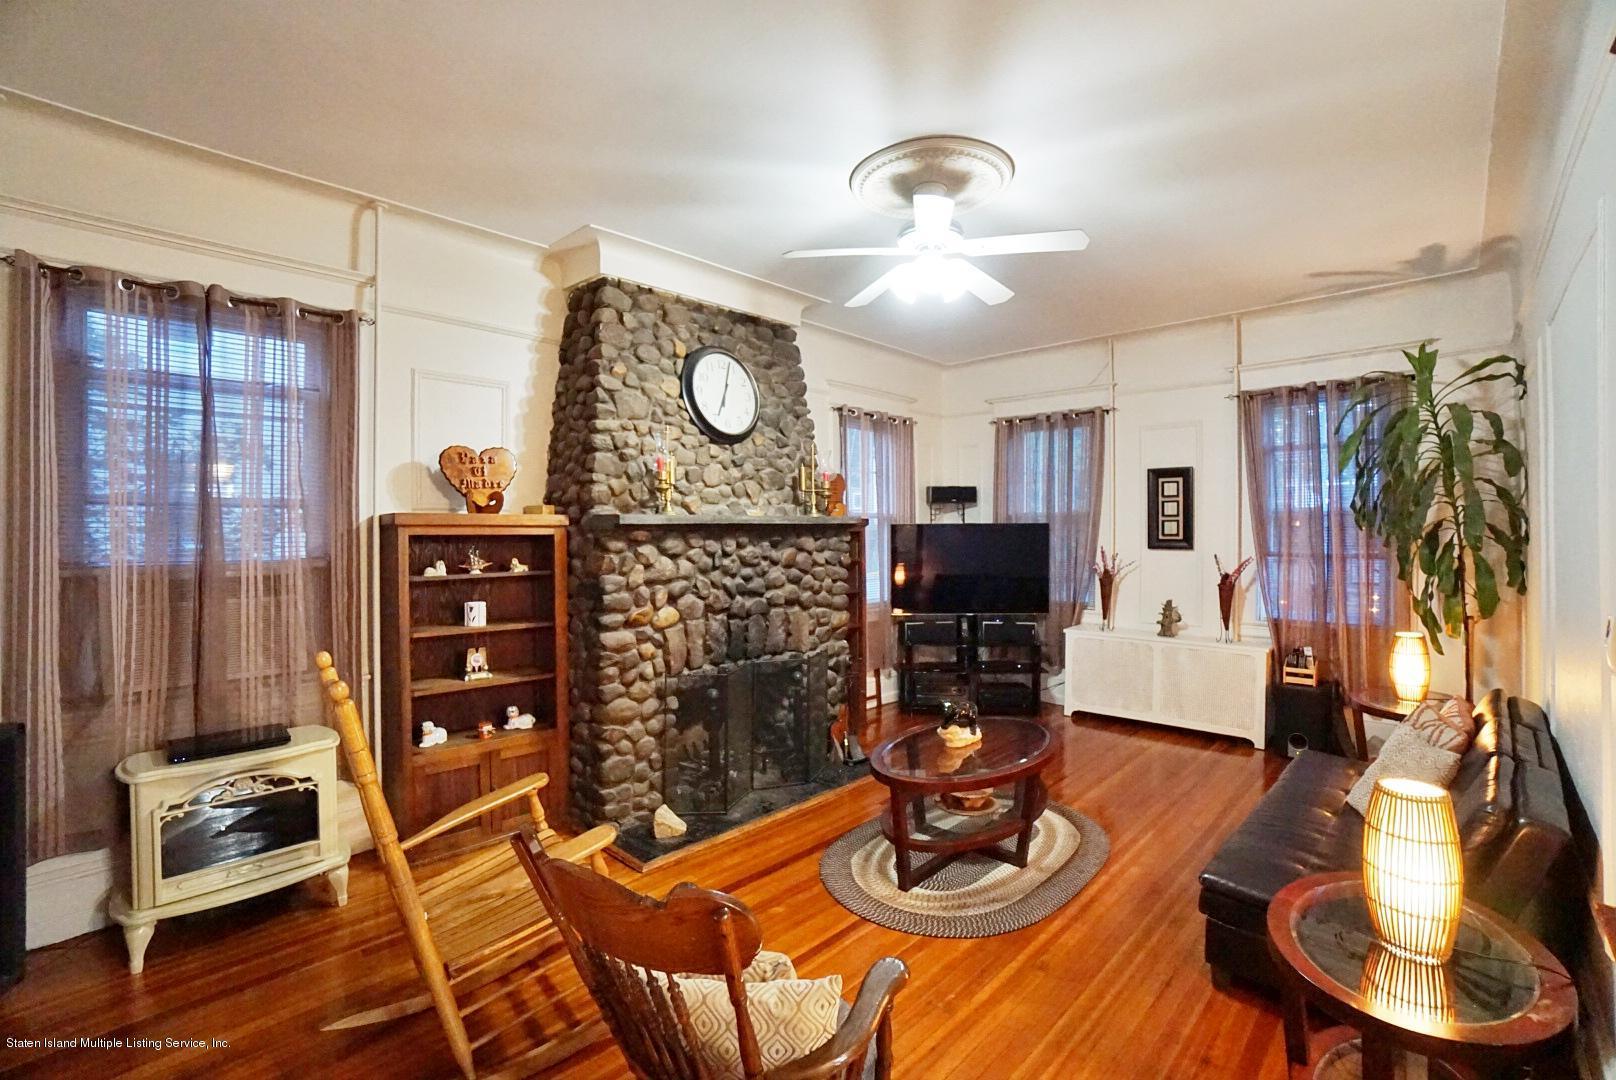 Single Family - Detached 31 Pelton Avenue  Staten Island, NY 10310, MLS-1132177-9